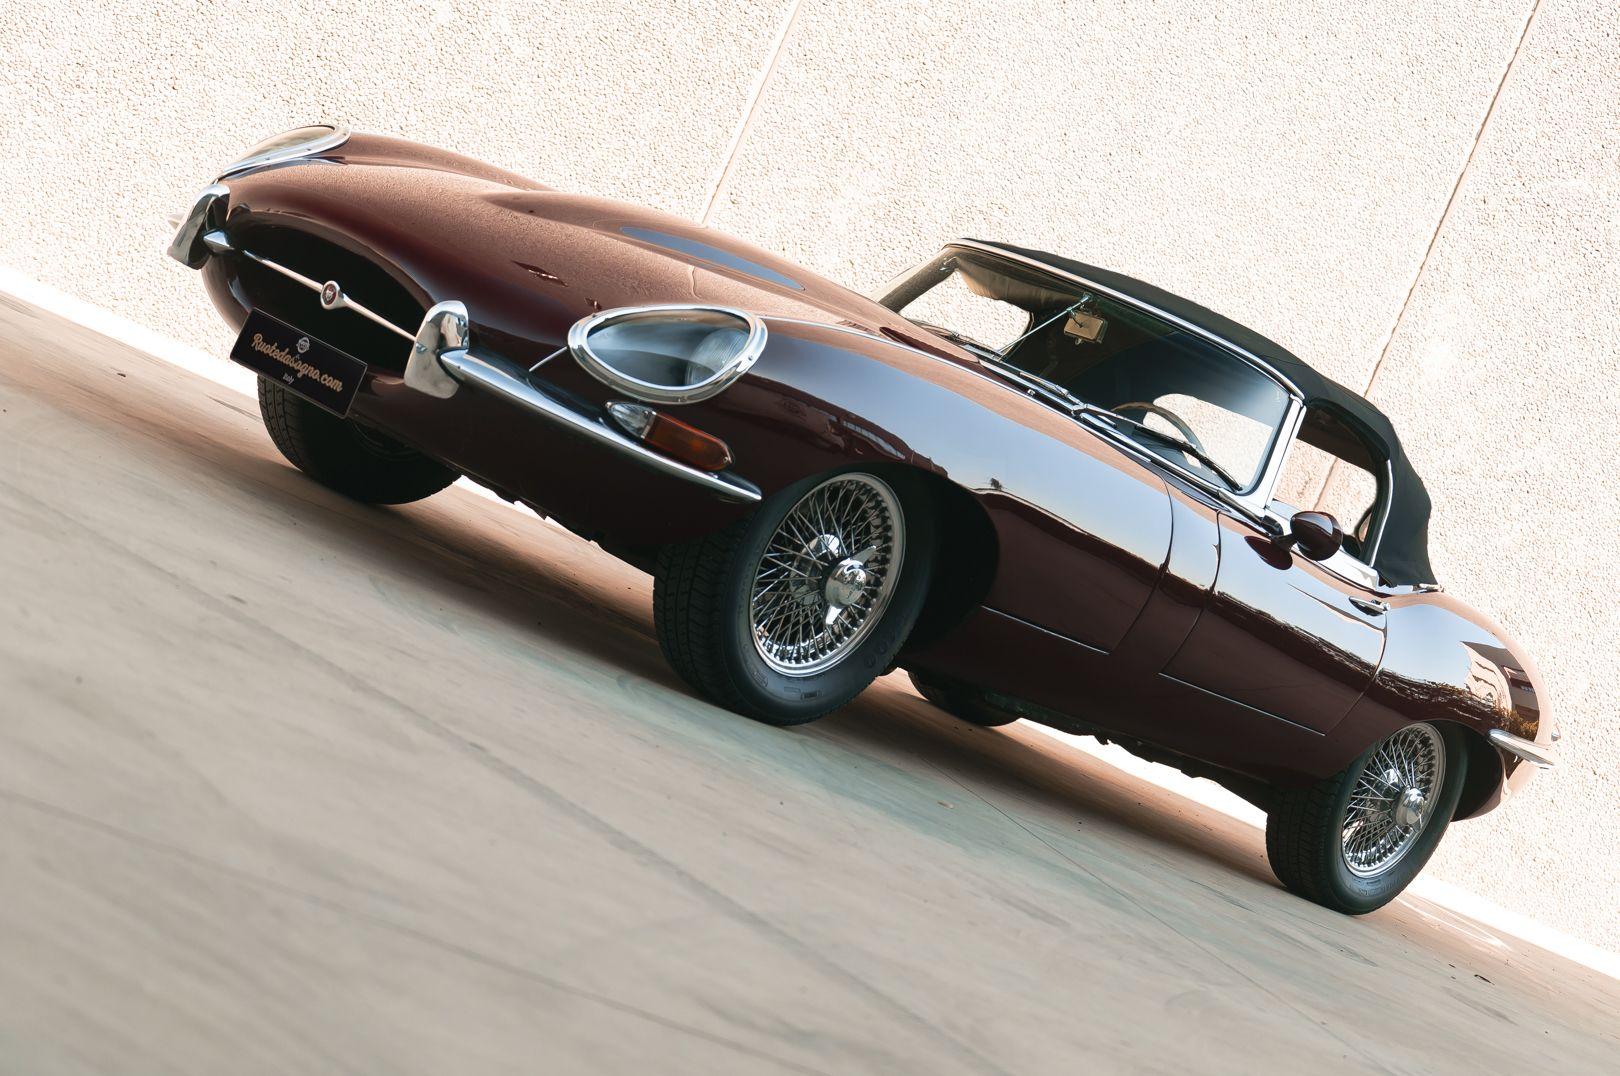 1968 Jaguar E-Type 4.2 Series 1 OTS 75583